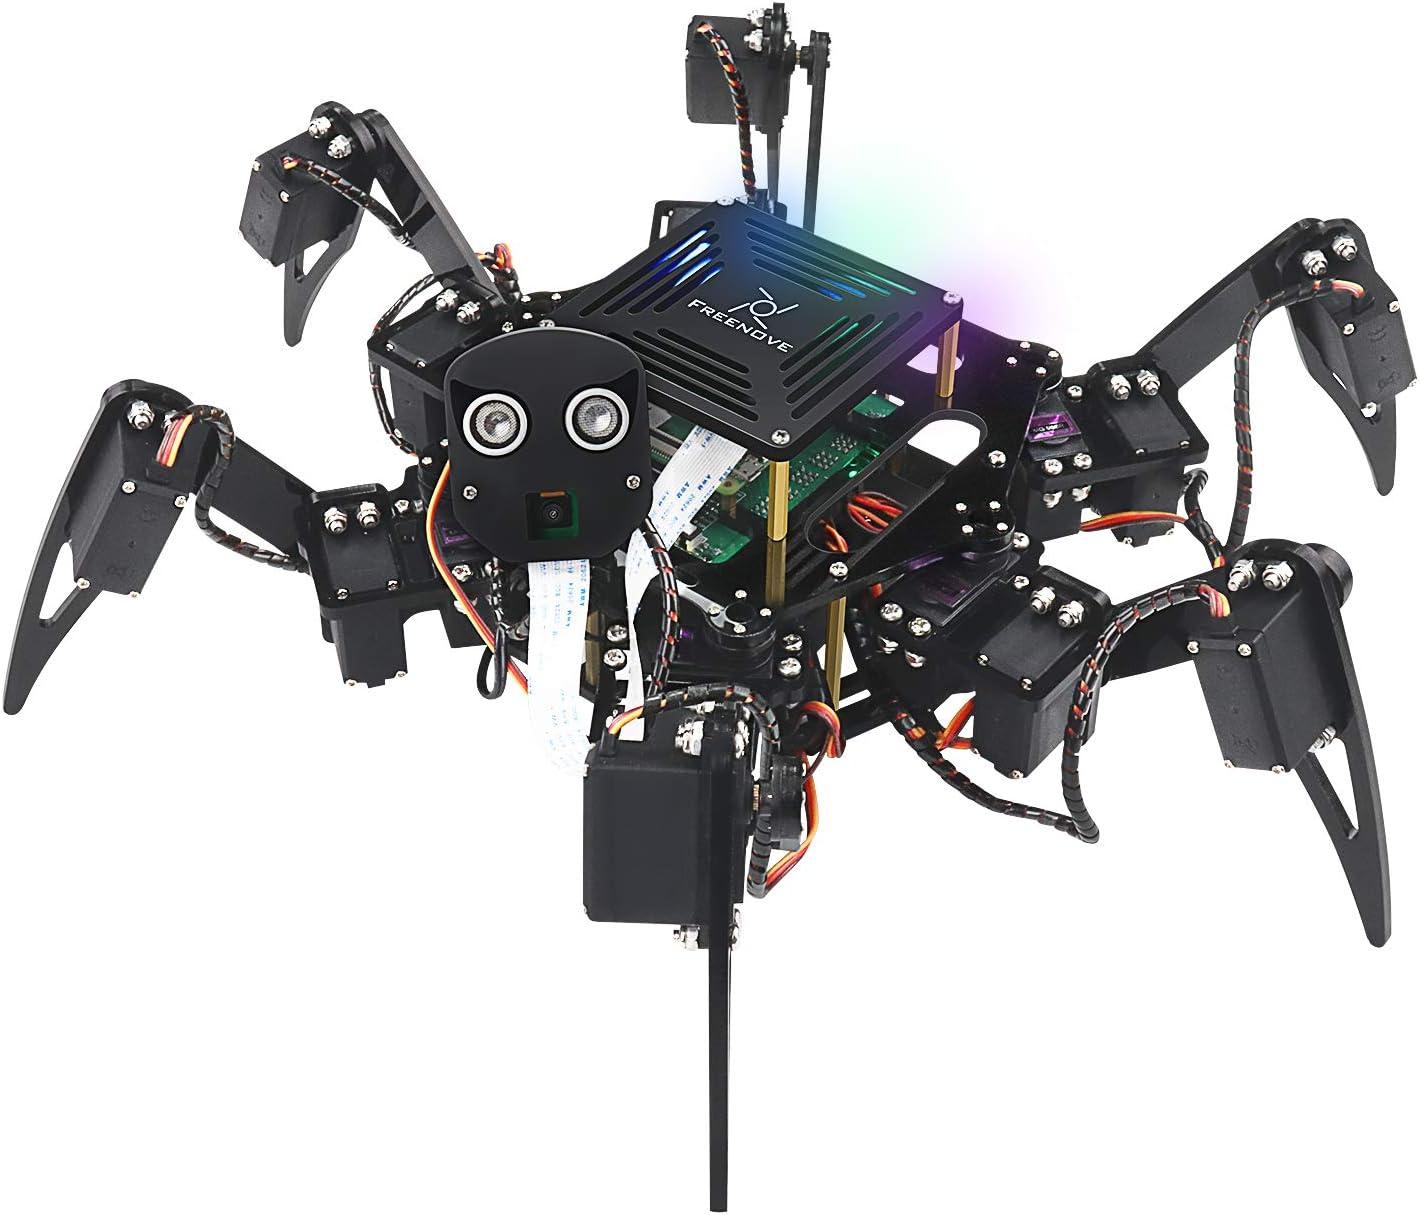 FreenoveBigHexapodRobotKitforRaspberryPi 4 B 3 B+ B A+, Walking, Self Balancing, Live Video, Face Recognition, Pan Tilt, Ultrasonic Ranging, Camera Servo Wireless RC